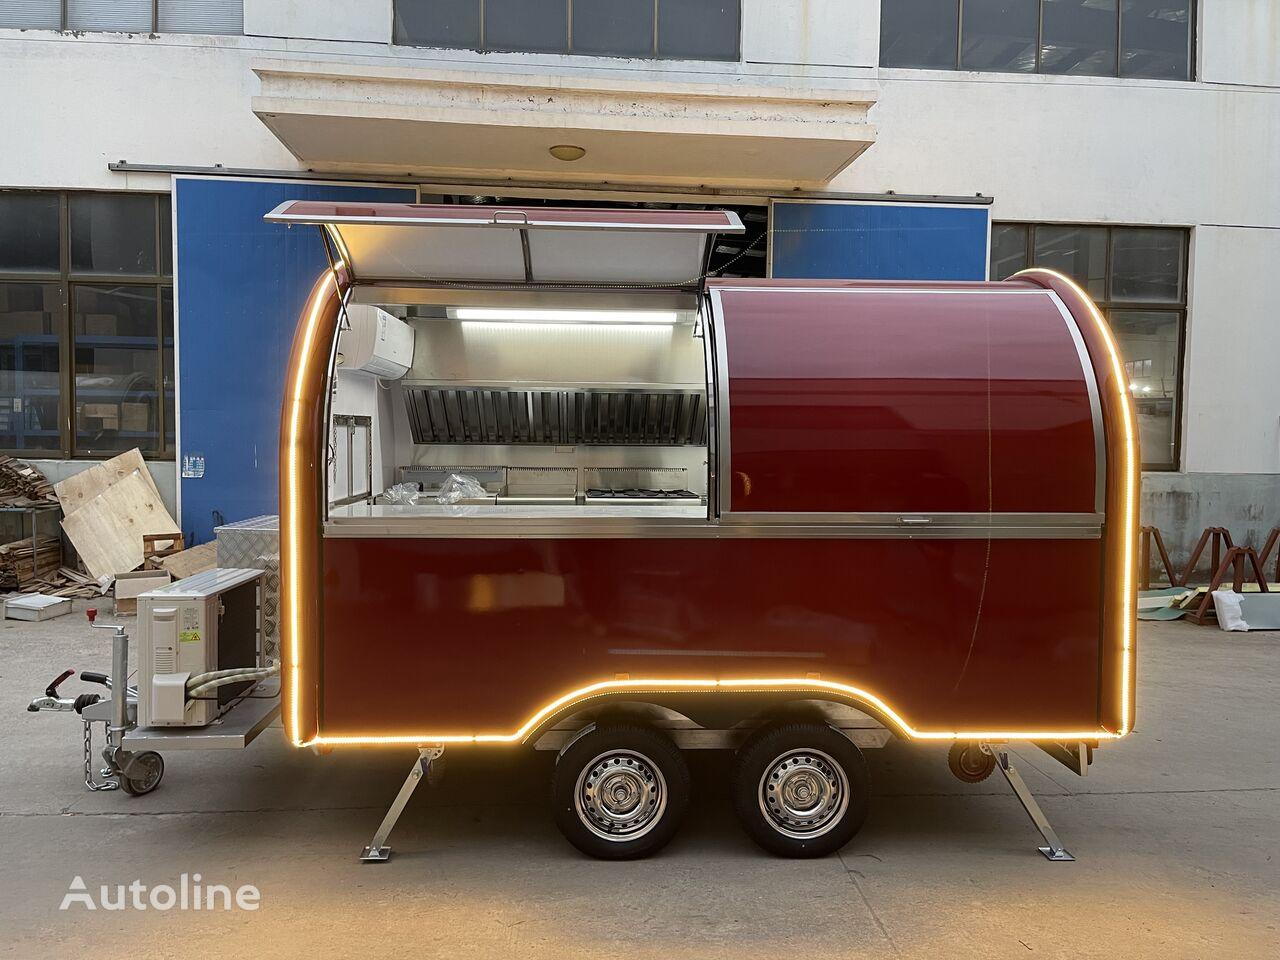 ERZODA Catering Trailer   Food Truck   Concession trailer   Food Traile vending trailer